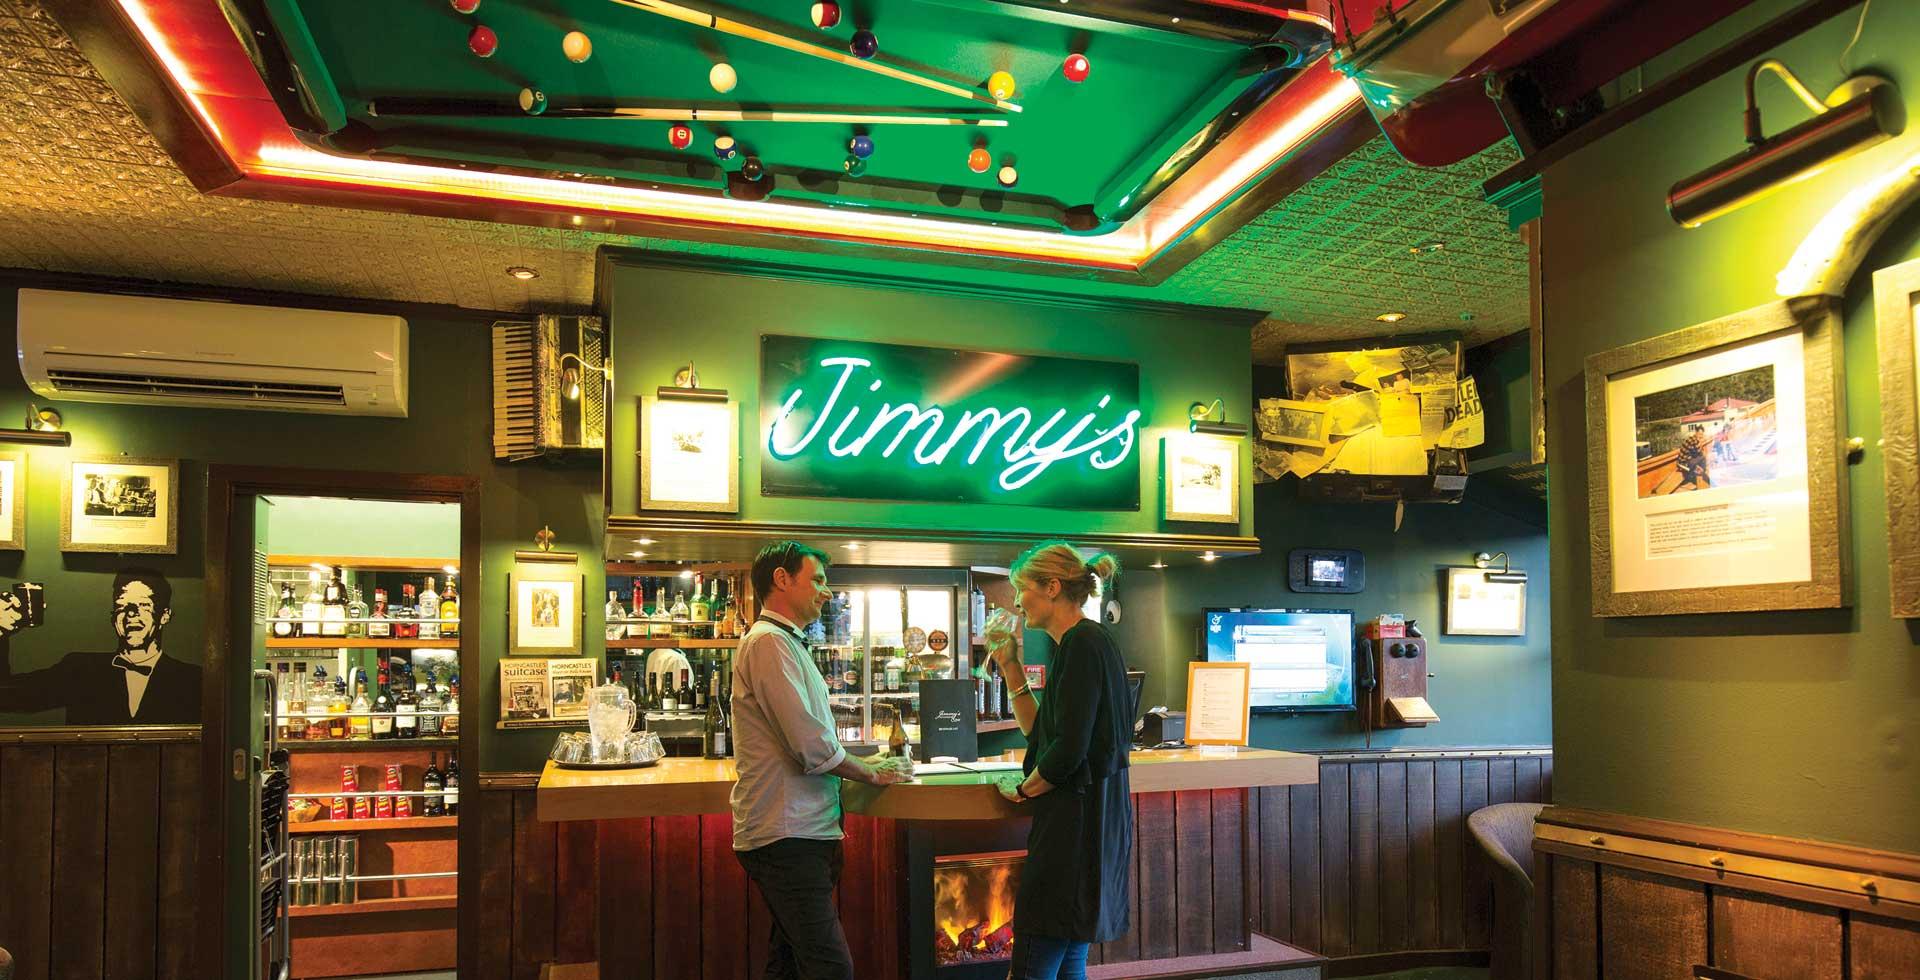 Jimmy s restaurant new zealand